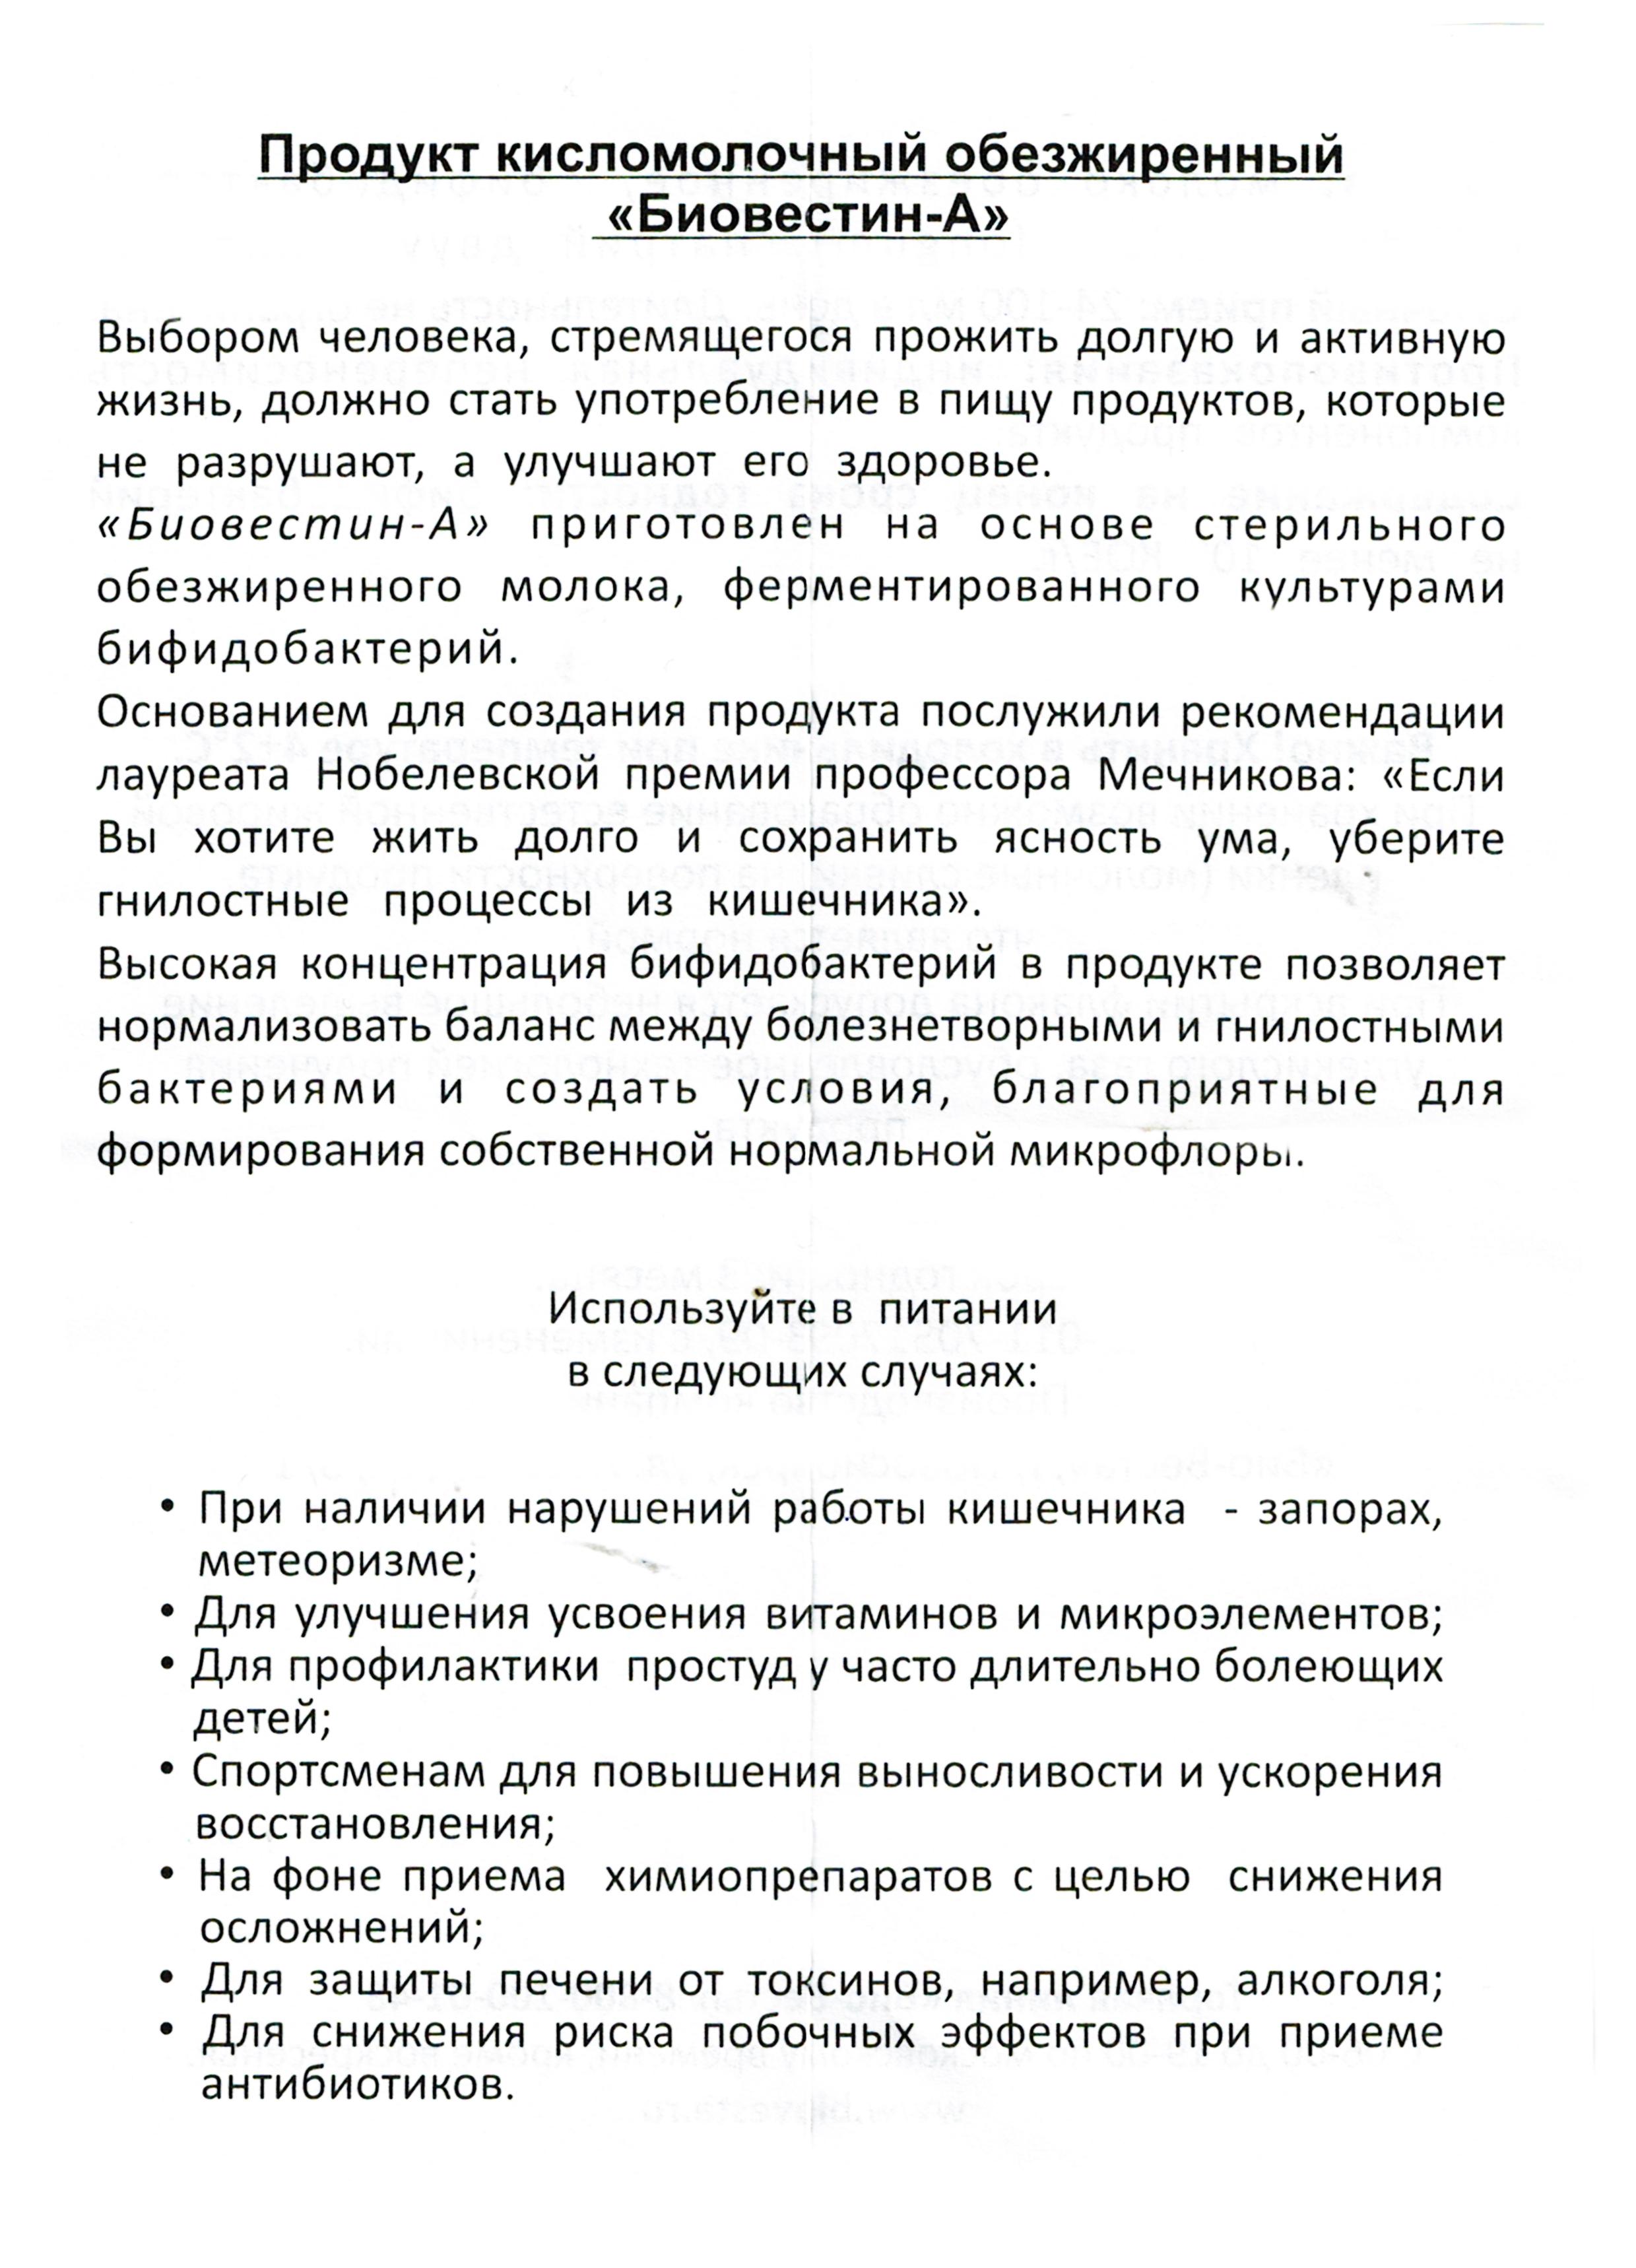 Биовестин а инструкция